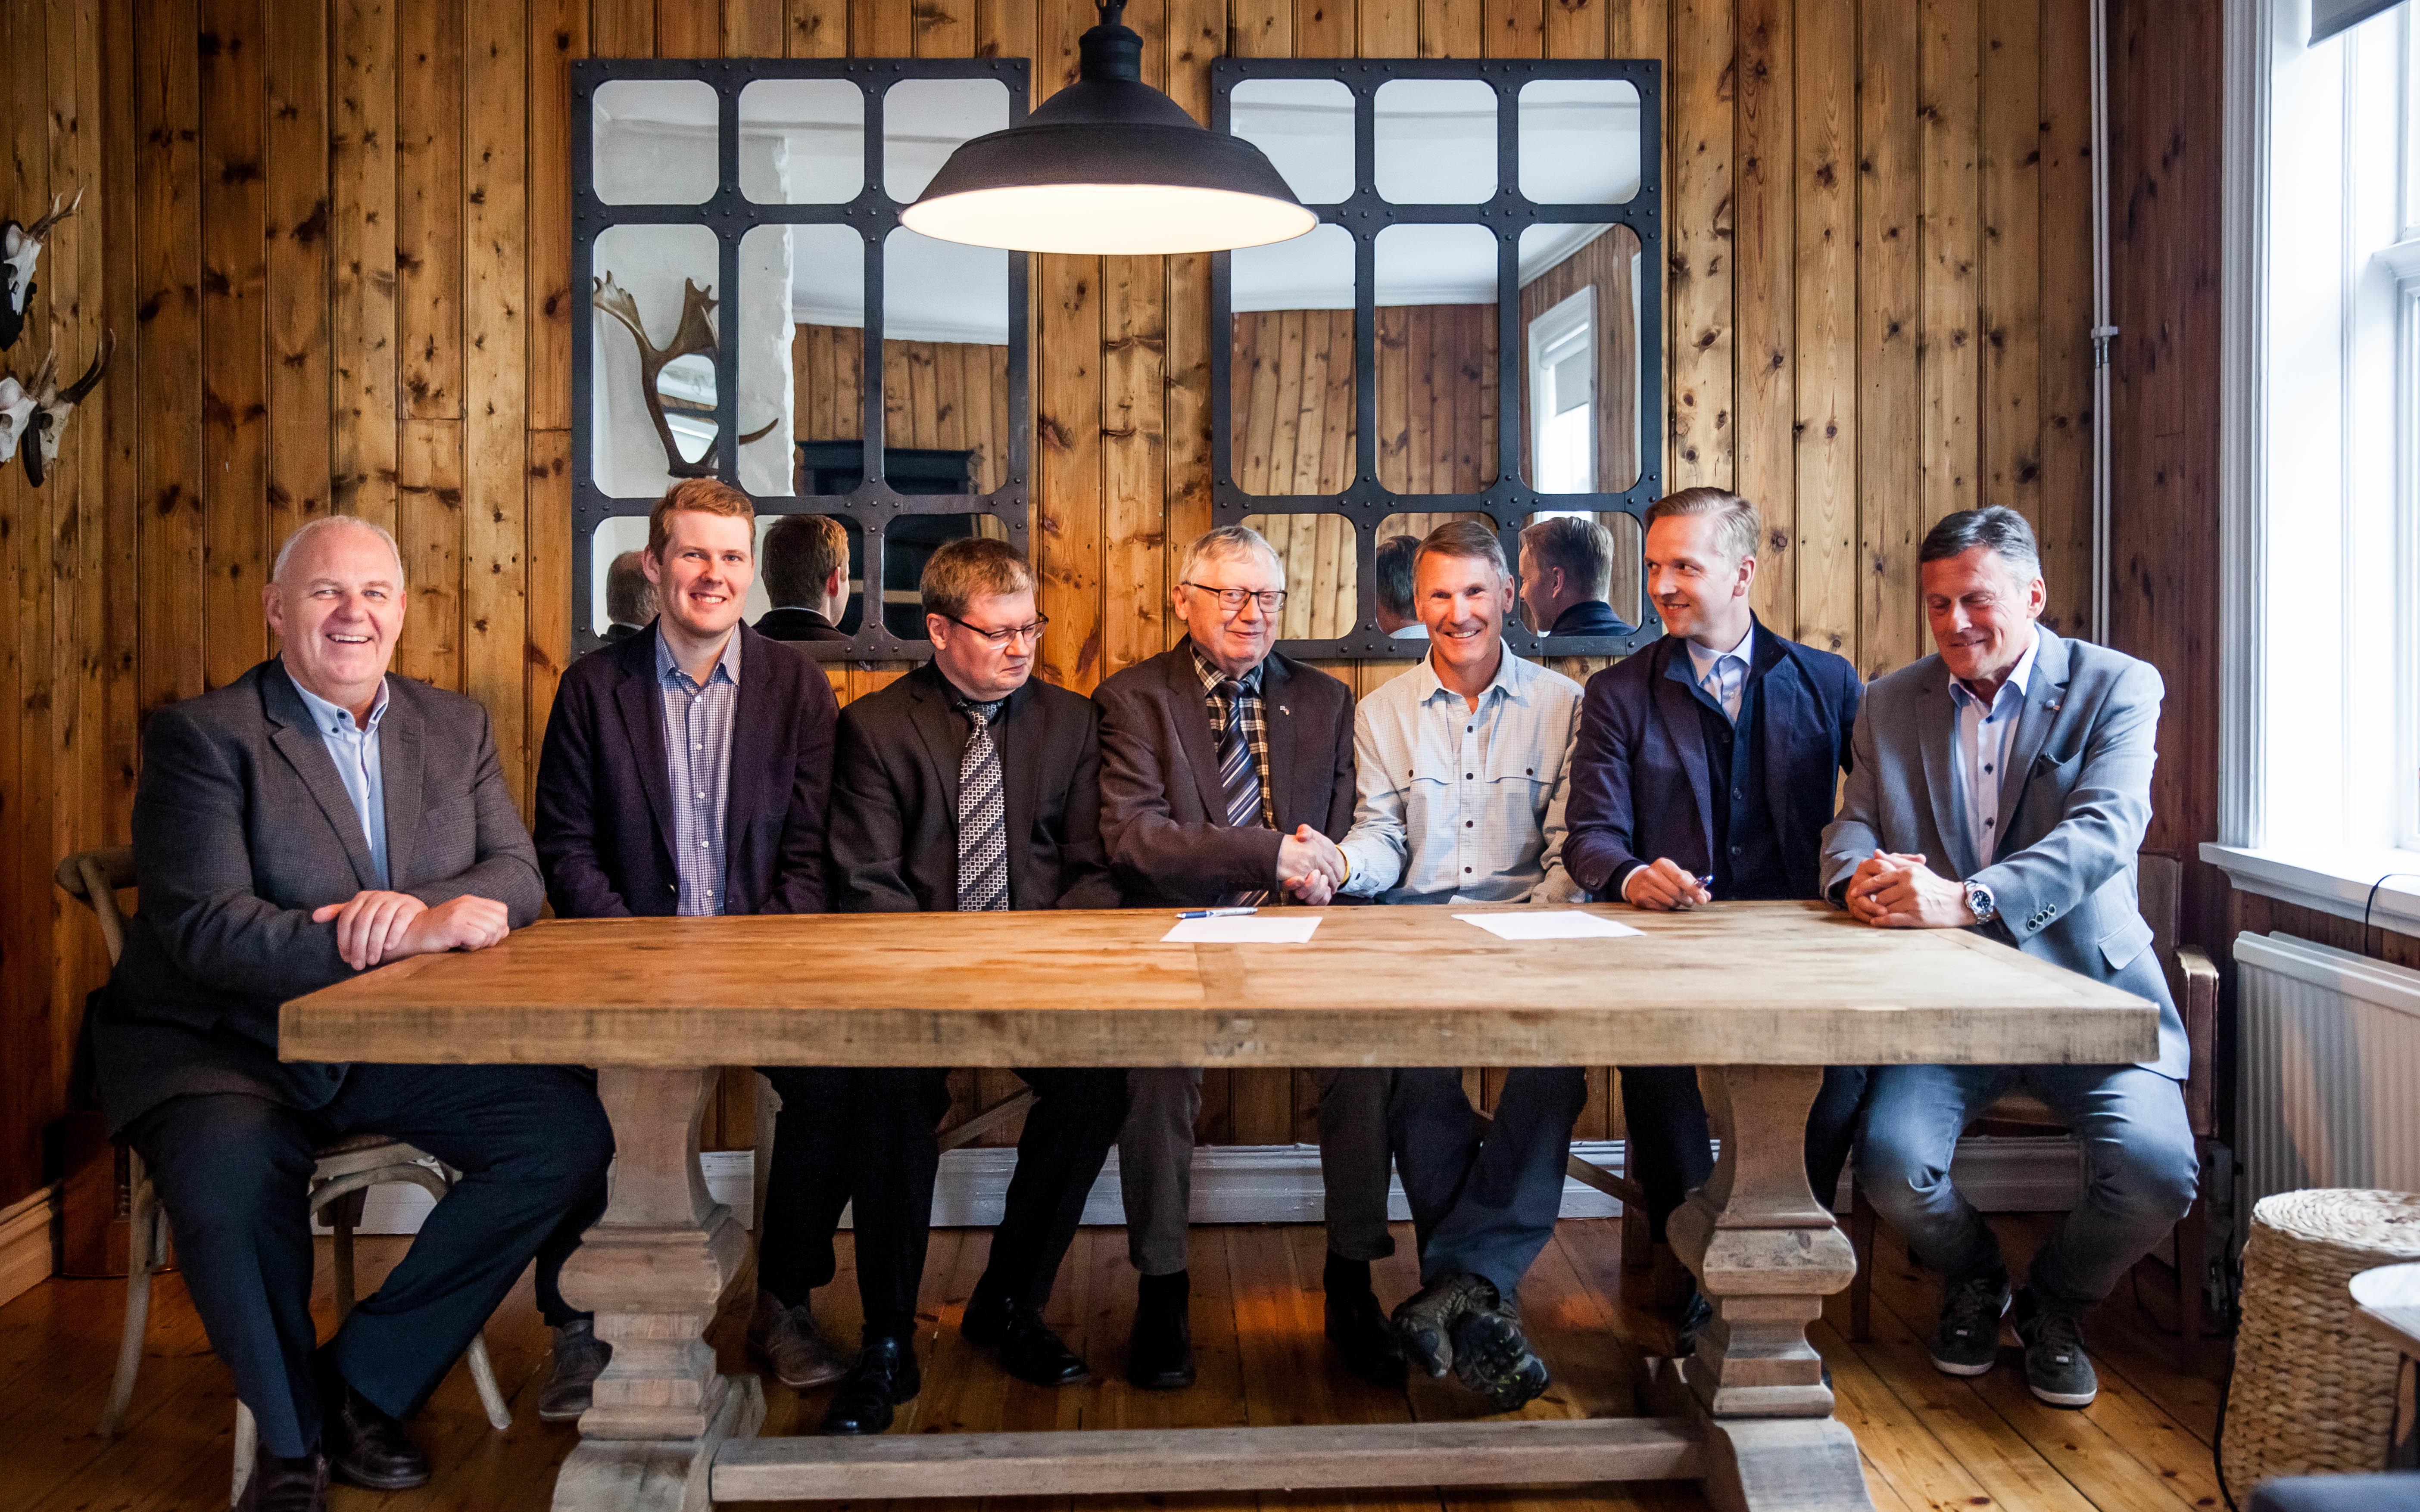 NASF, ASF, & Laksaskip delegations